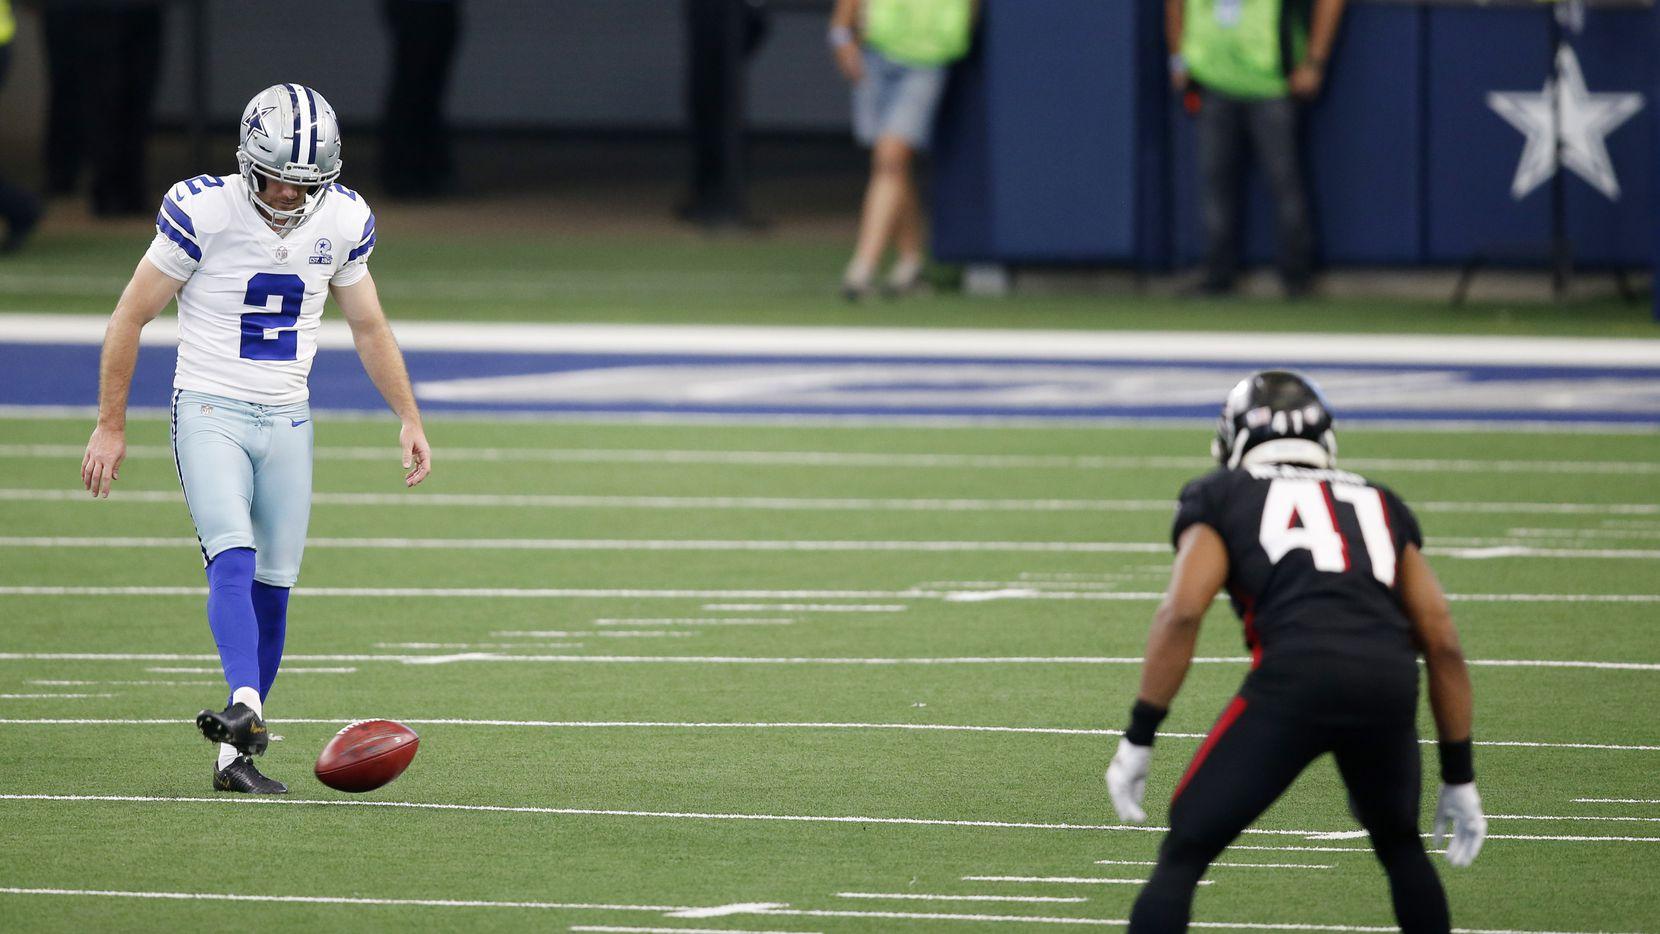 Dallas Cowboys kicker Greg Zuerlein (2) attempts an onside kick against the Atlanta Falcons during the fourth quarter of play at AT&T Stadium in Arlington, Texas on Sunday, September 20, 2020. Dallas Cowboys defeated the Atlanta Falcons 40-39.